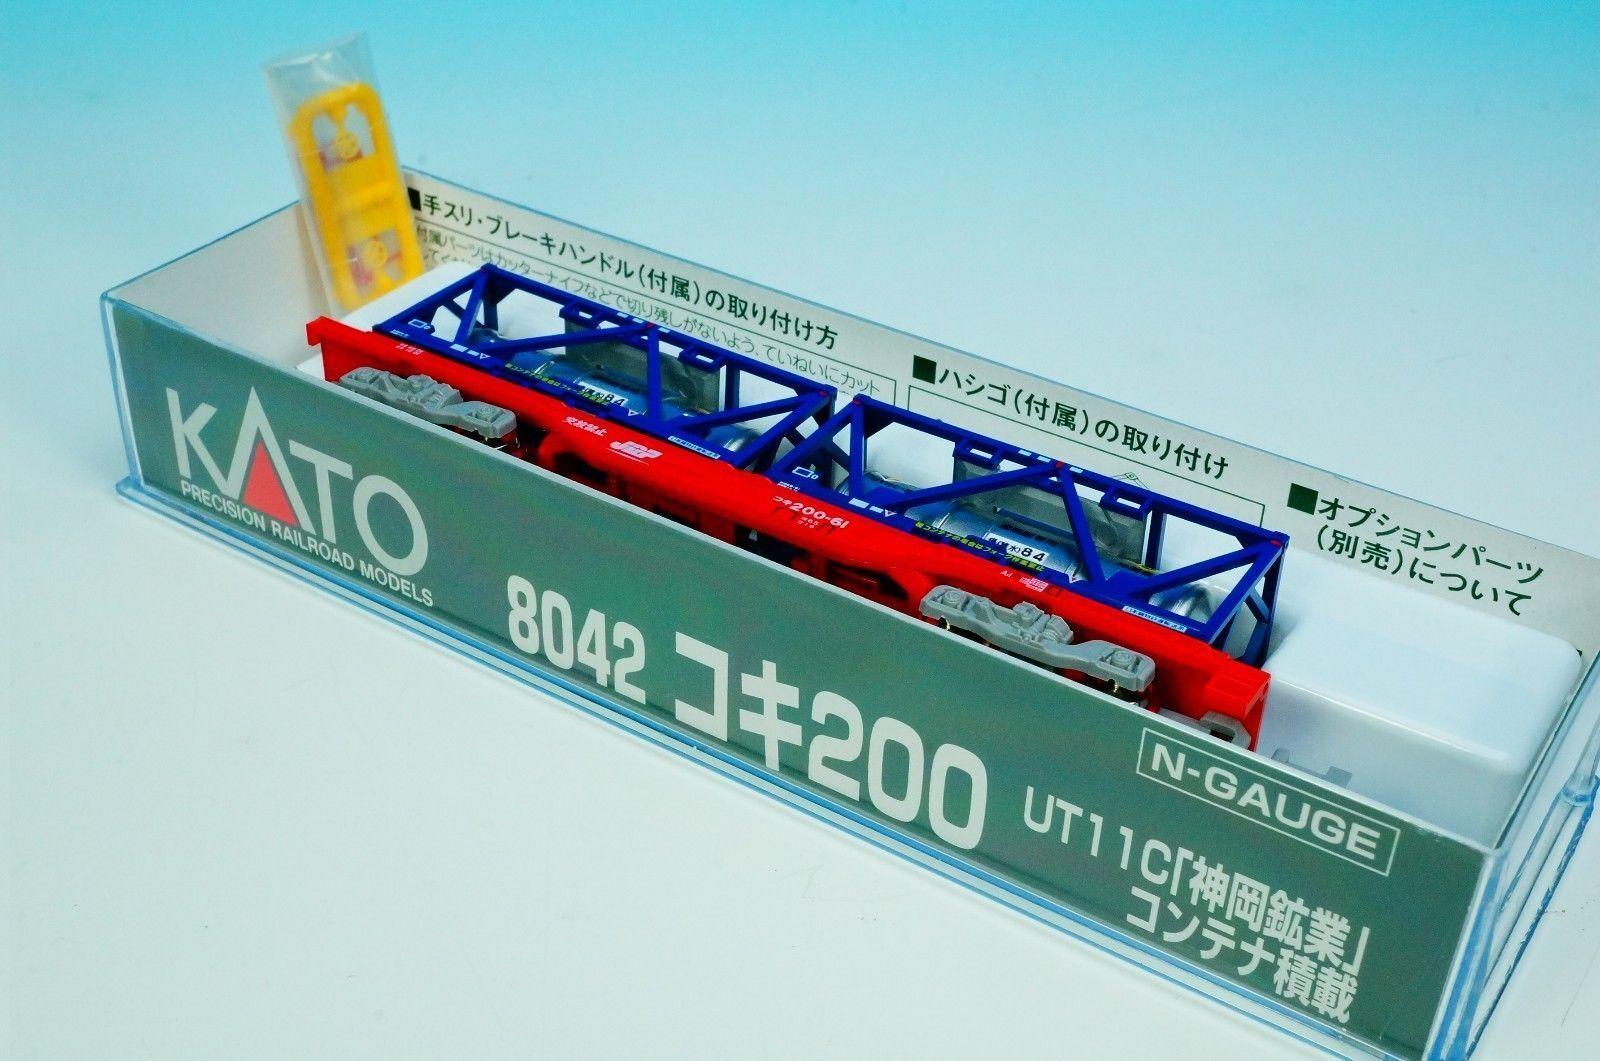 KATO 8042 N Scale Gauge Train WAGON TANK CONTAINER Citerne Railway model